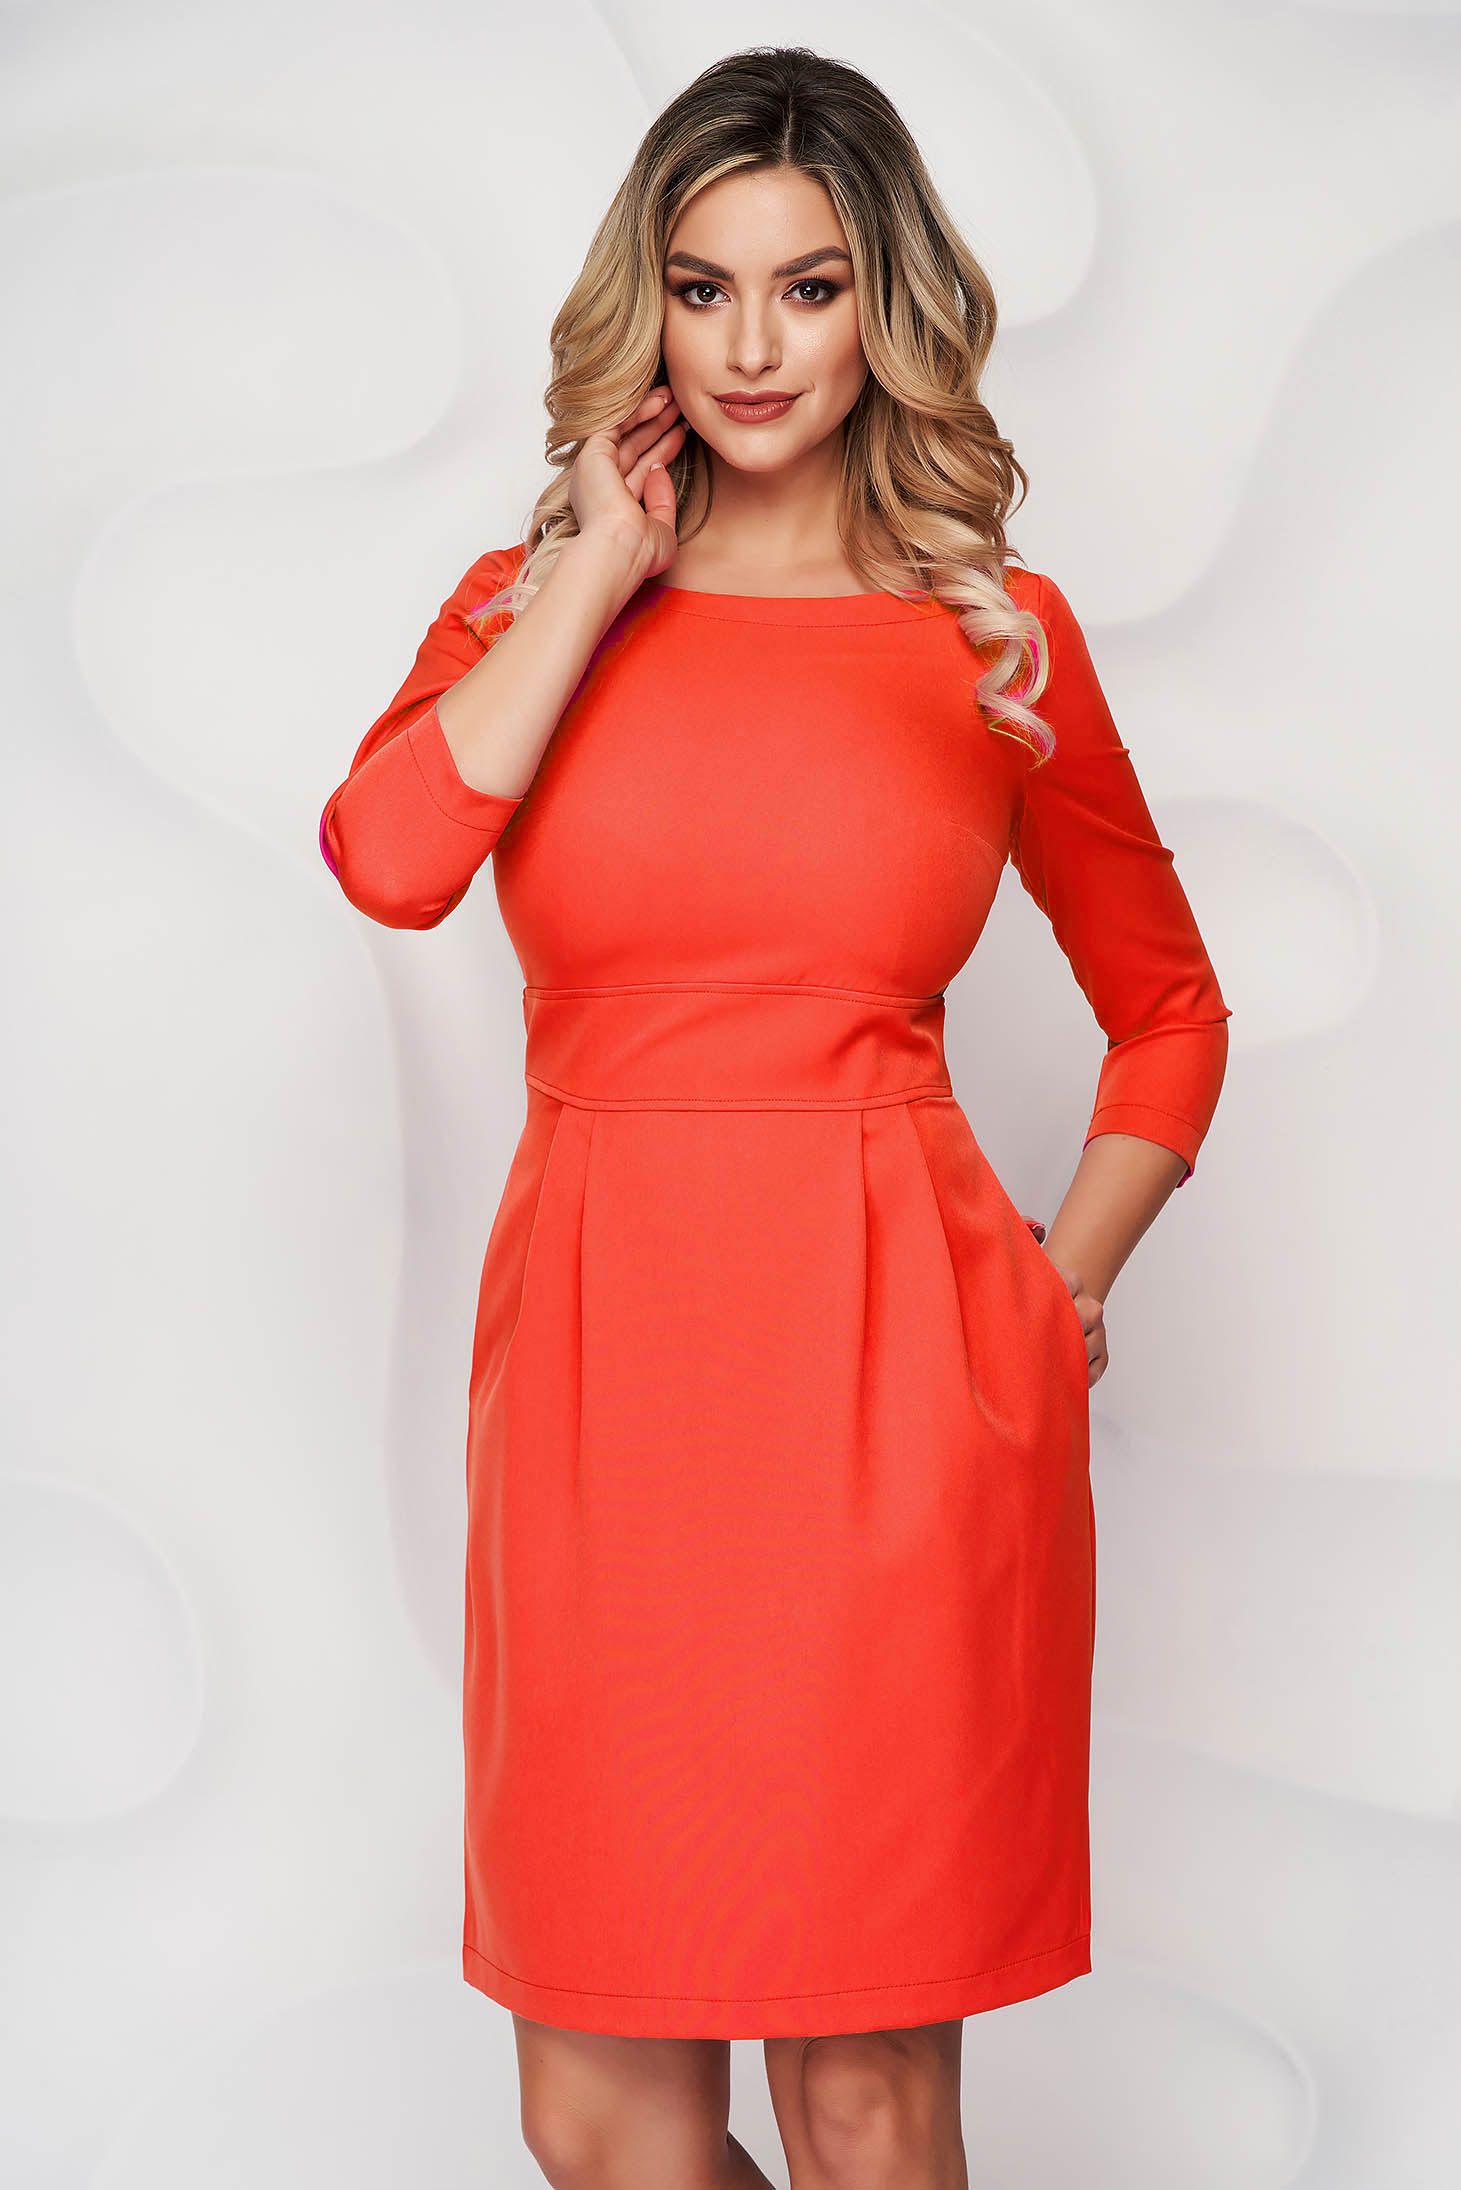 StarShinerS orange dress slightly elastic fabric with pockets short cut a-line